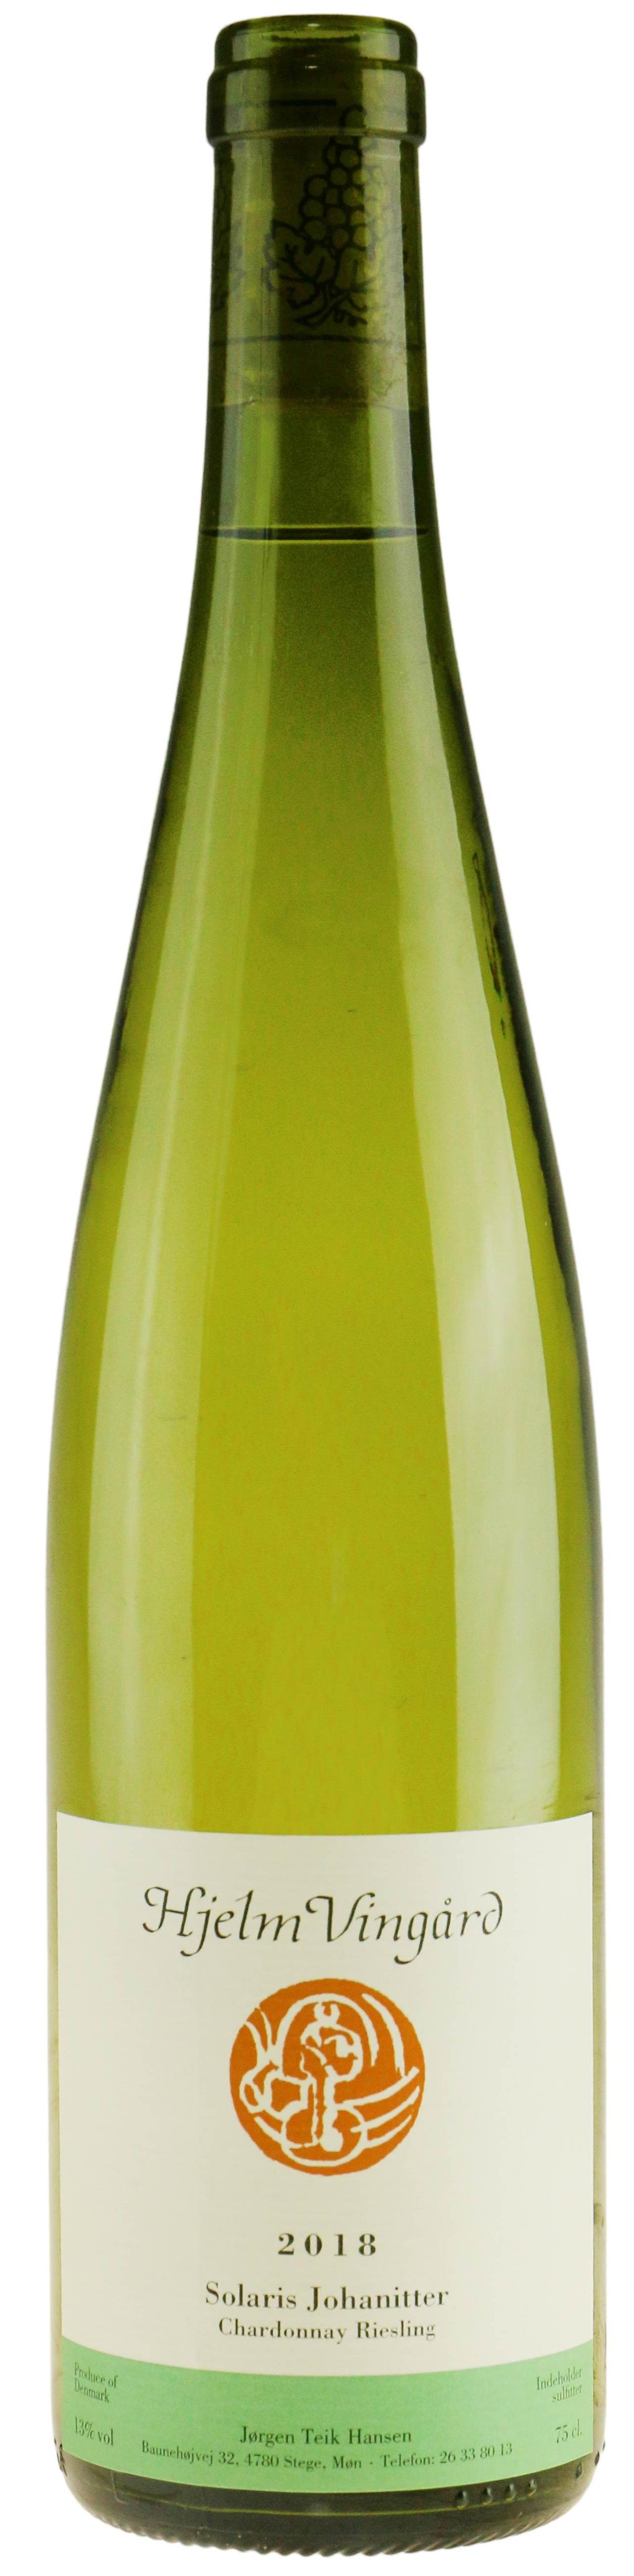 Hjelm Solaris (Johanitter, Riesling, Chardonnay)